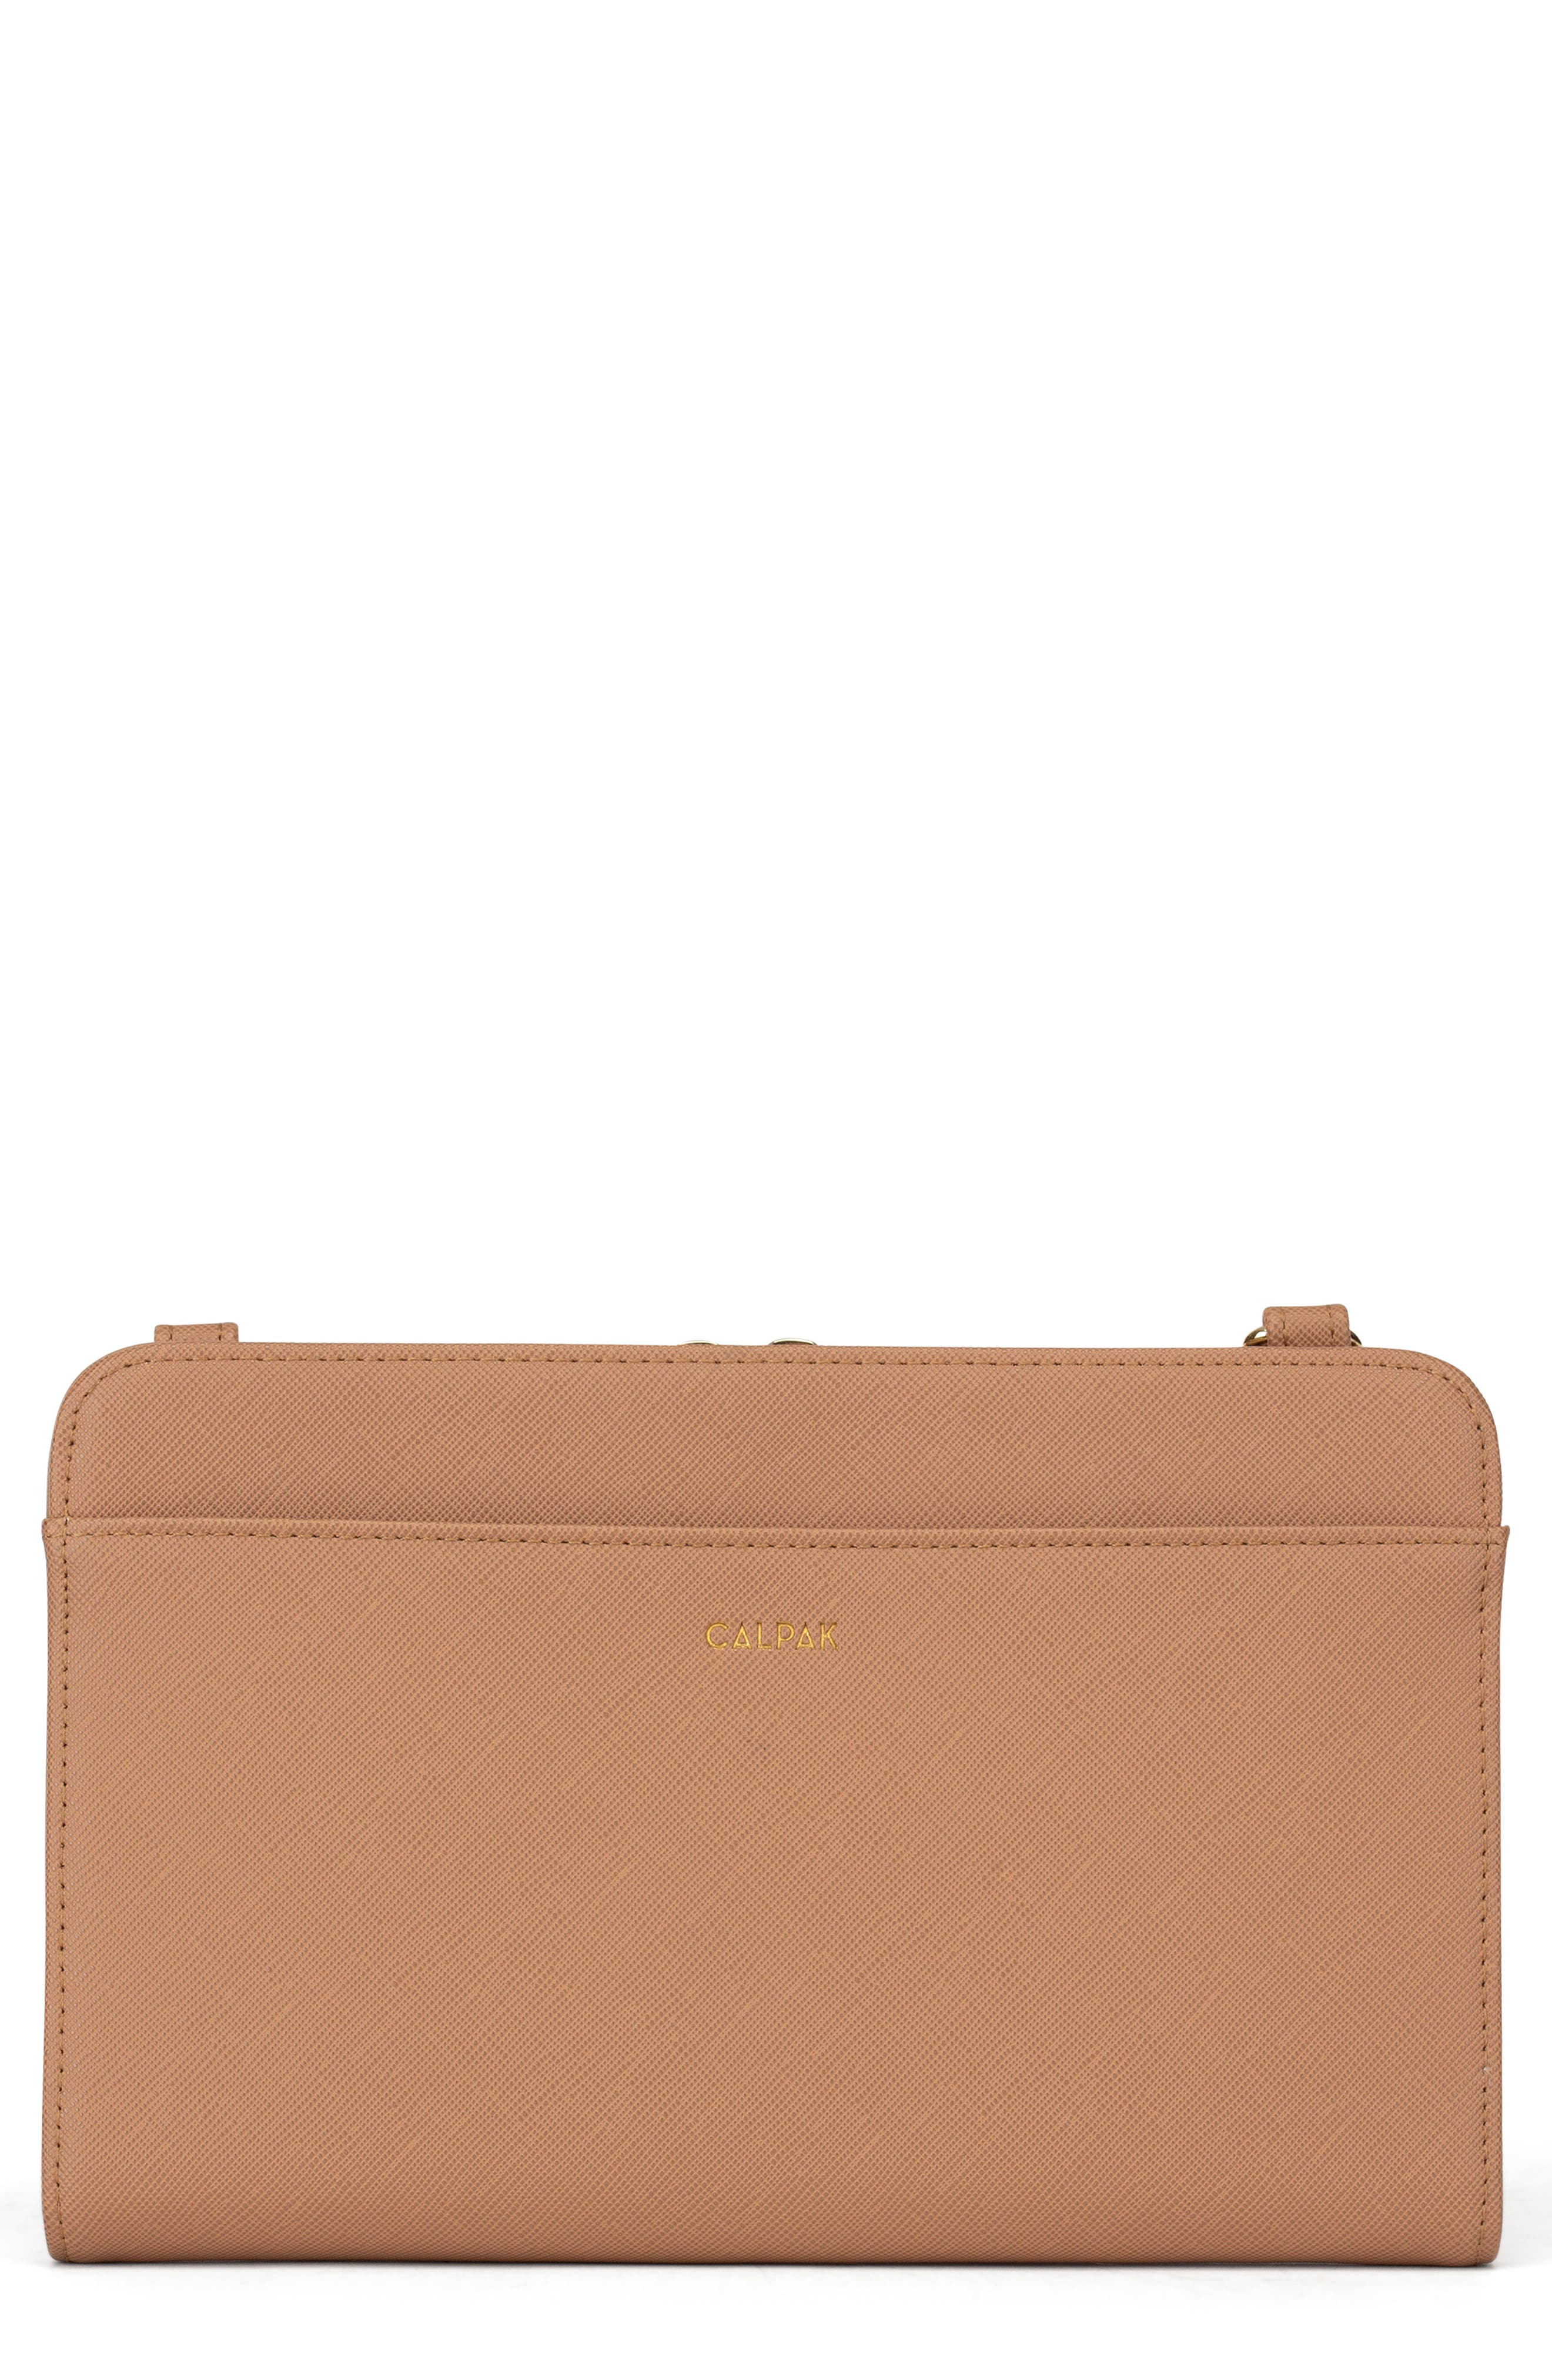 CALPAK Faux Leather RFID Travel Wallet, Main, color, CARAMEL